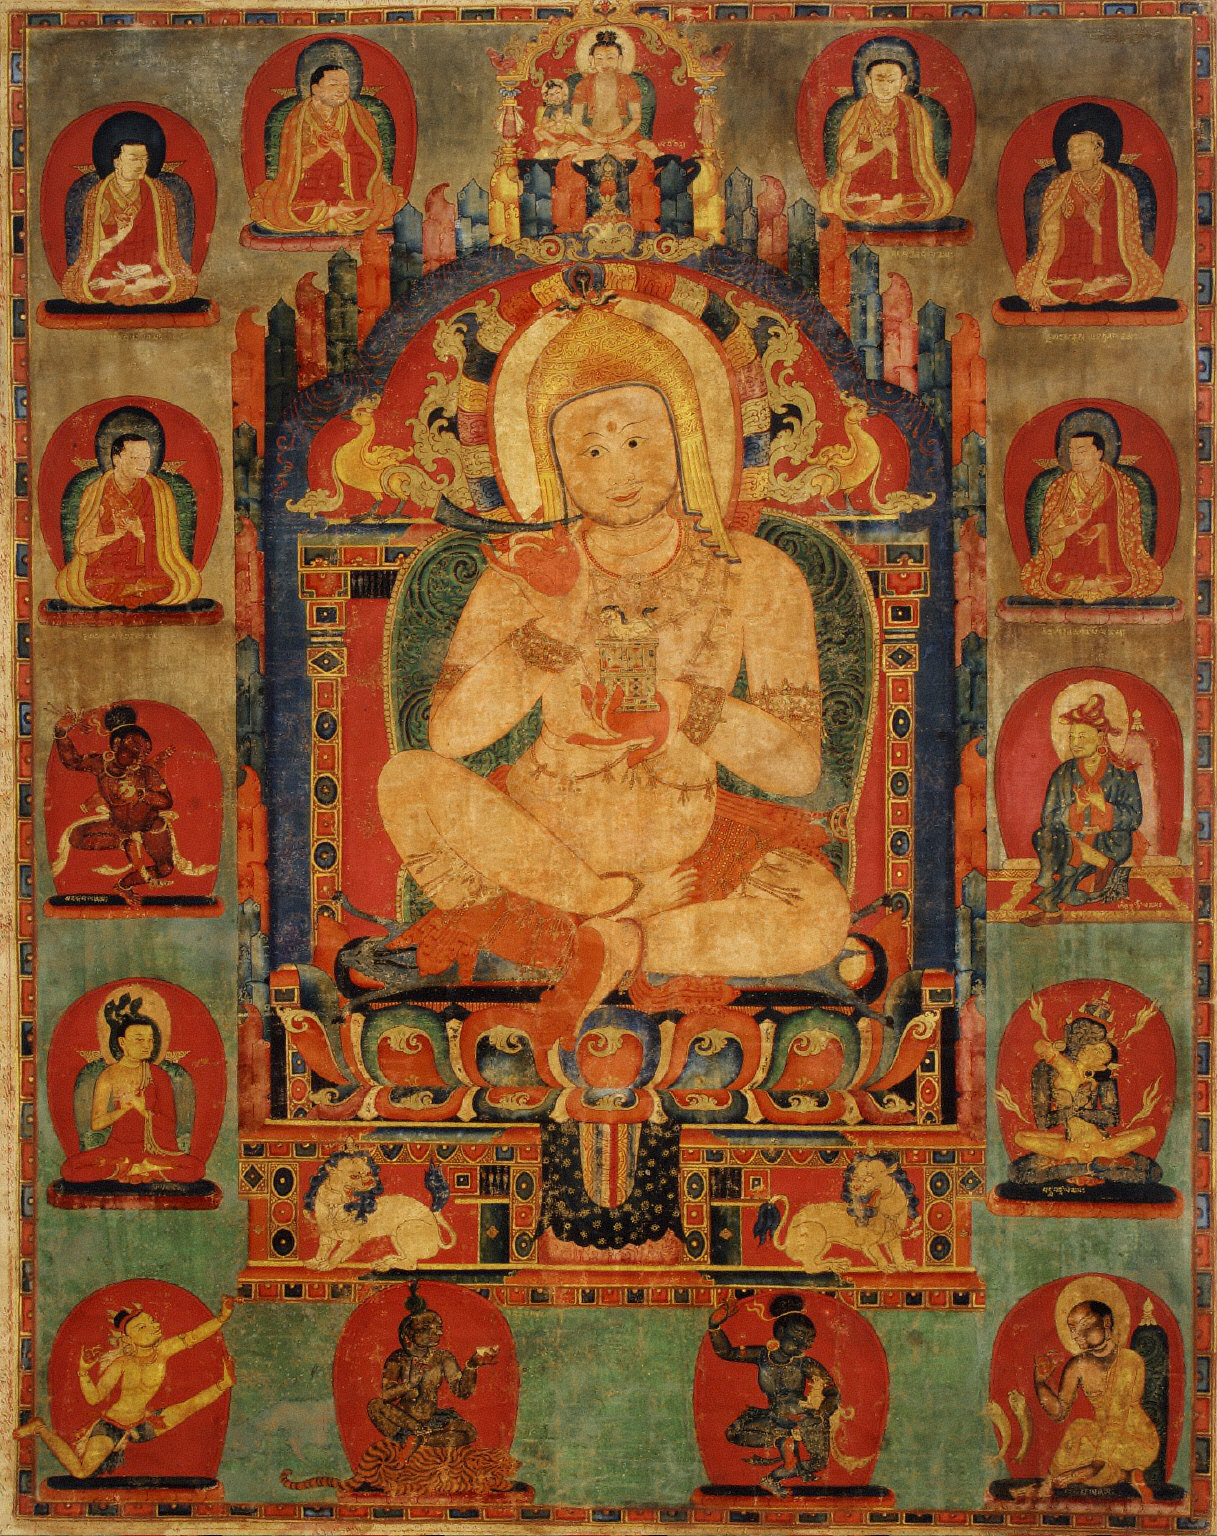 Portrait of Jnanatapa surrounded by lamas and mahasiddhas